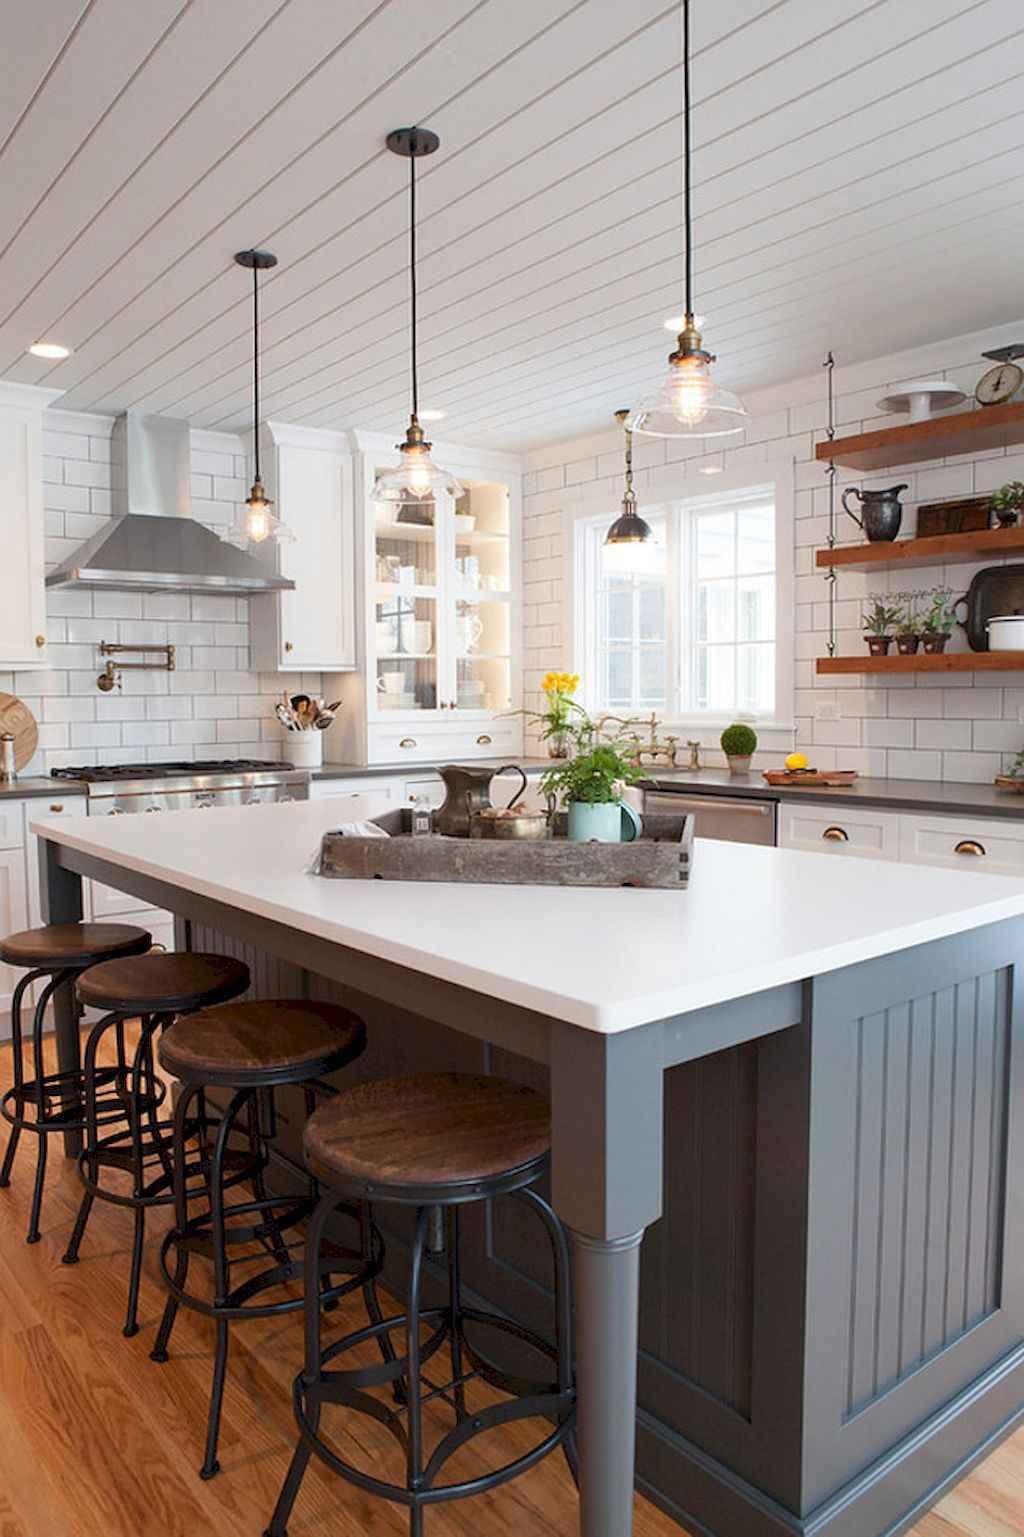 100 Stunning Farmhouse Kitchen Ideas On A Budget 97 Coachdecorcom